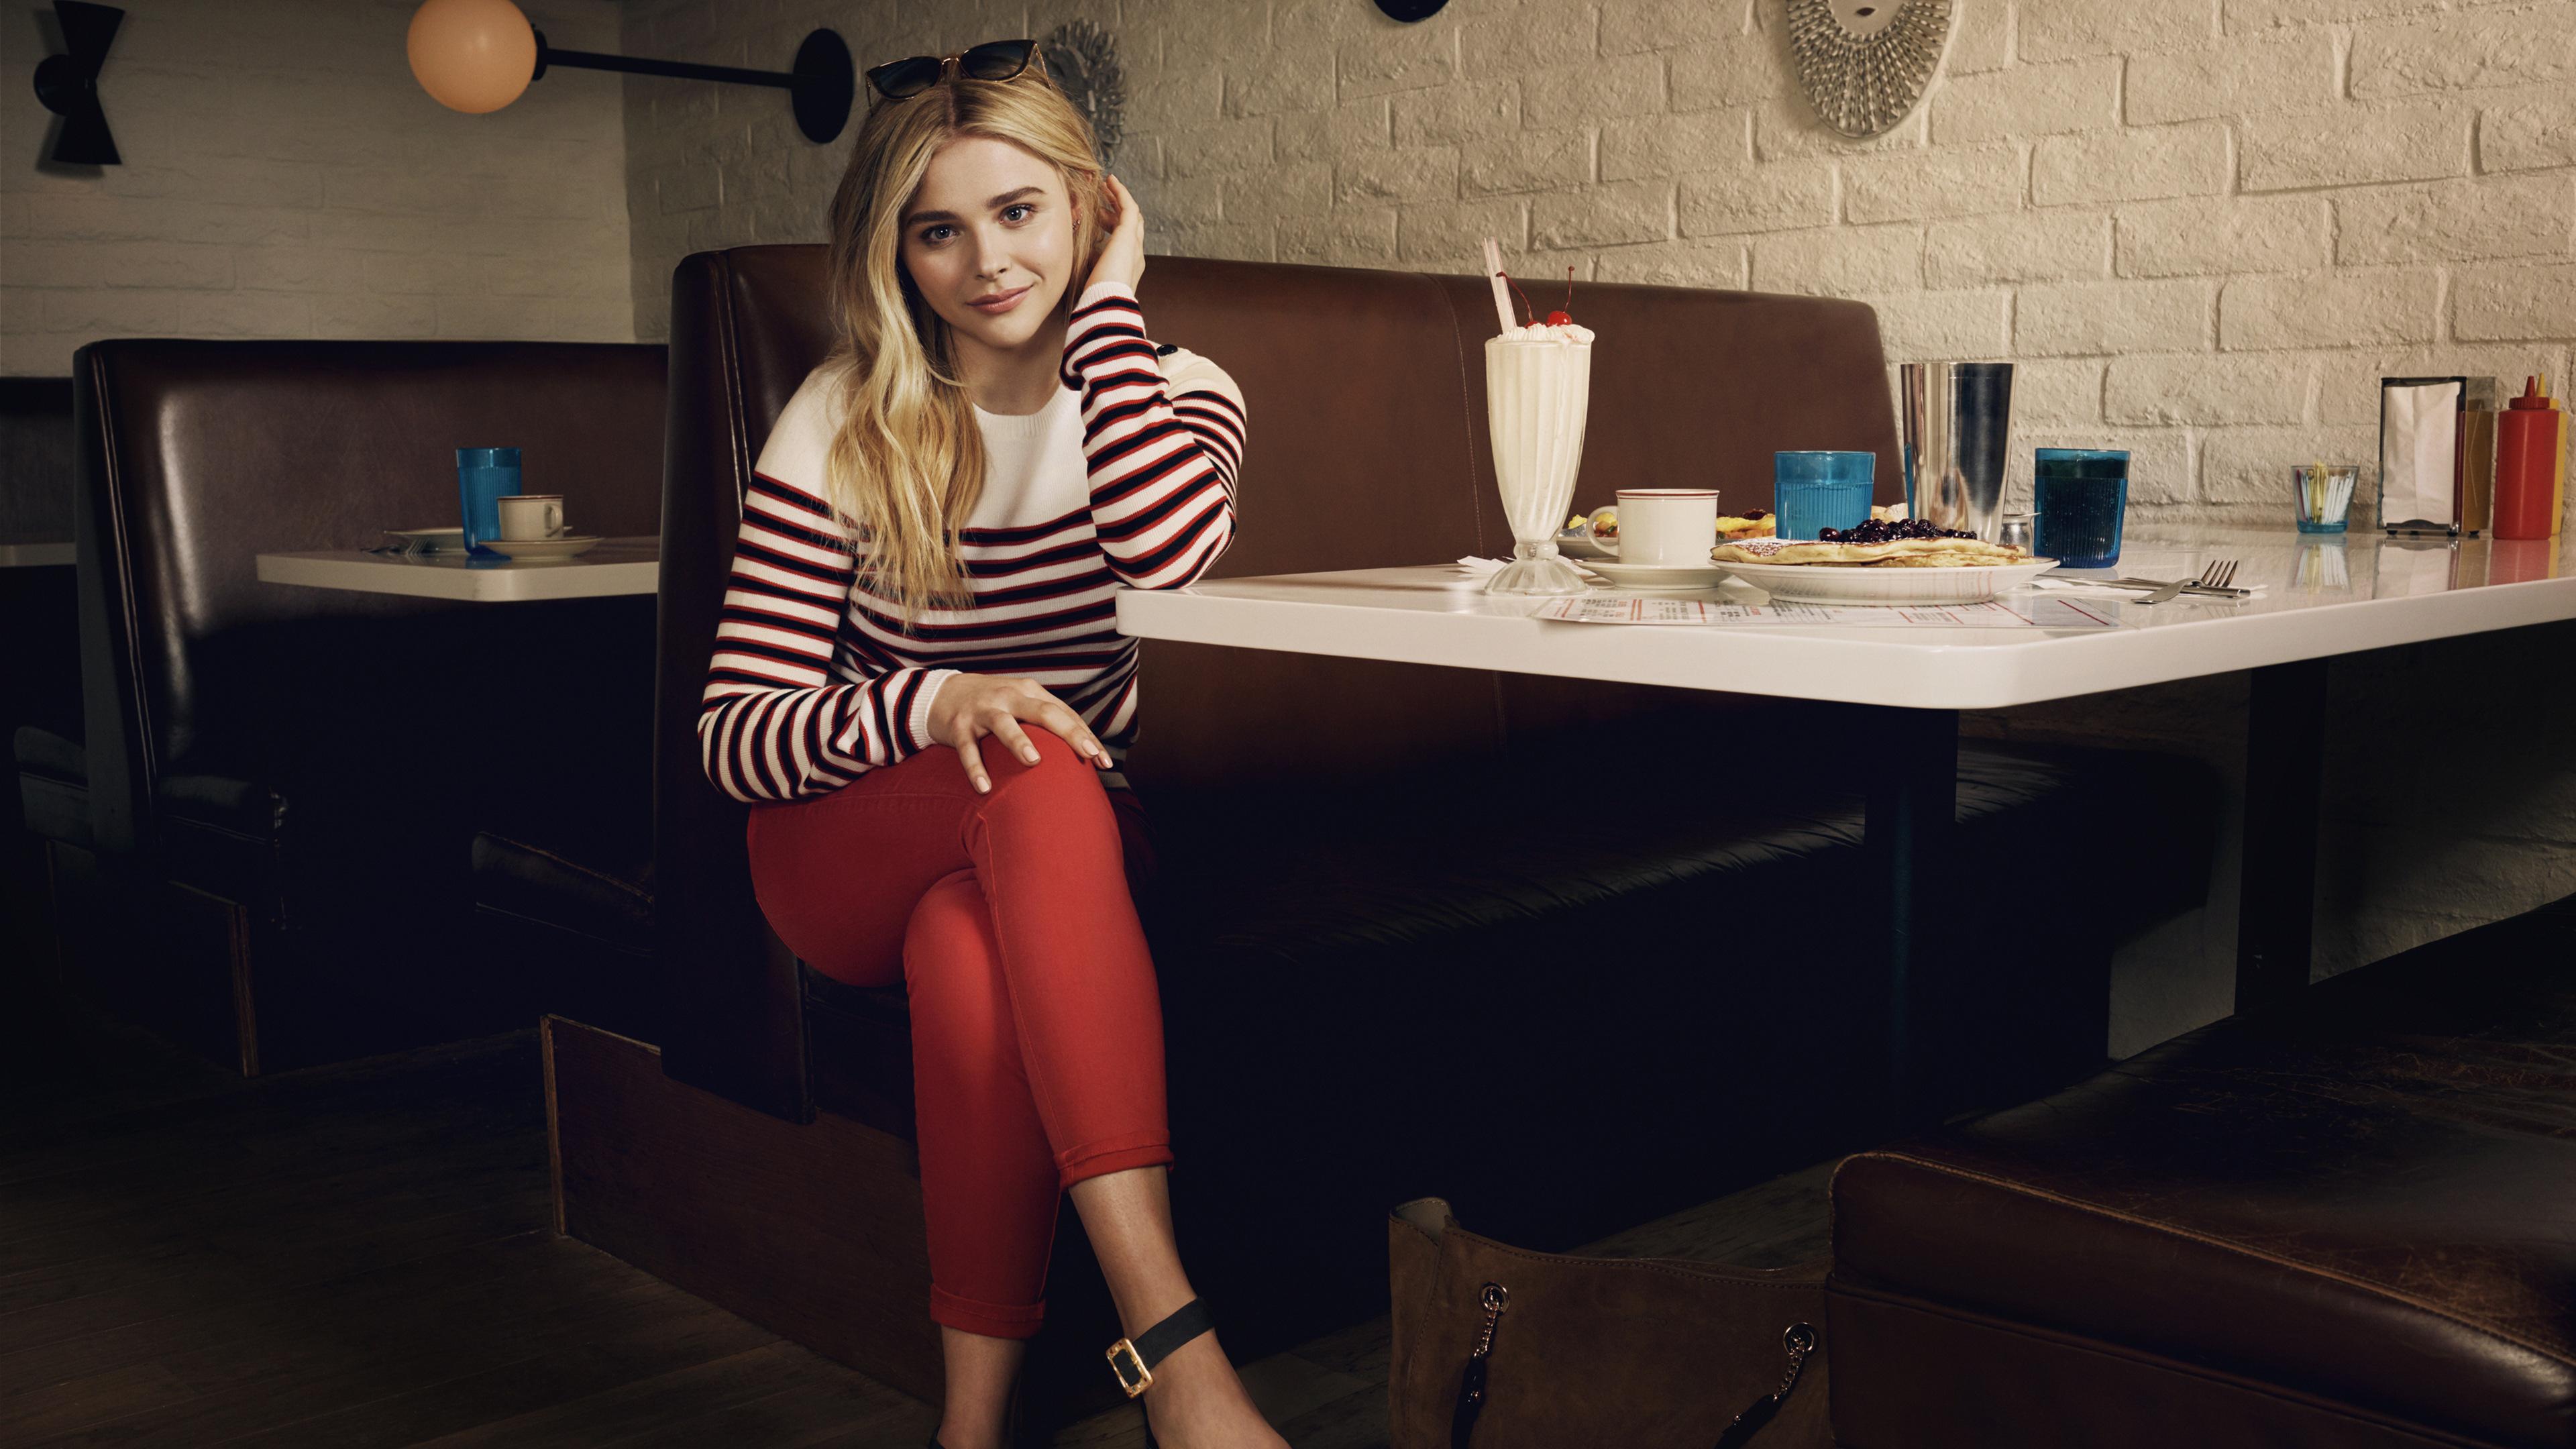 Fondos de pantalla Chloe Moretz en un restaurant